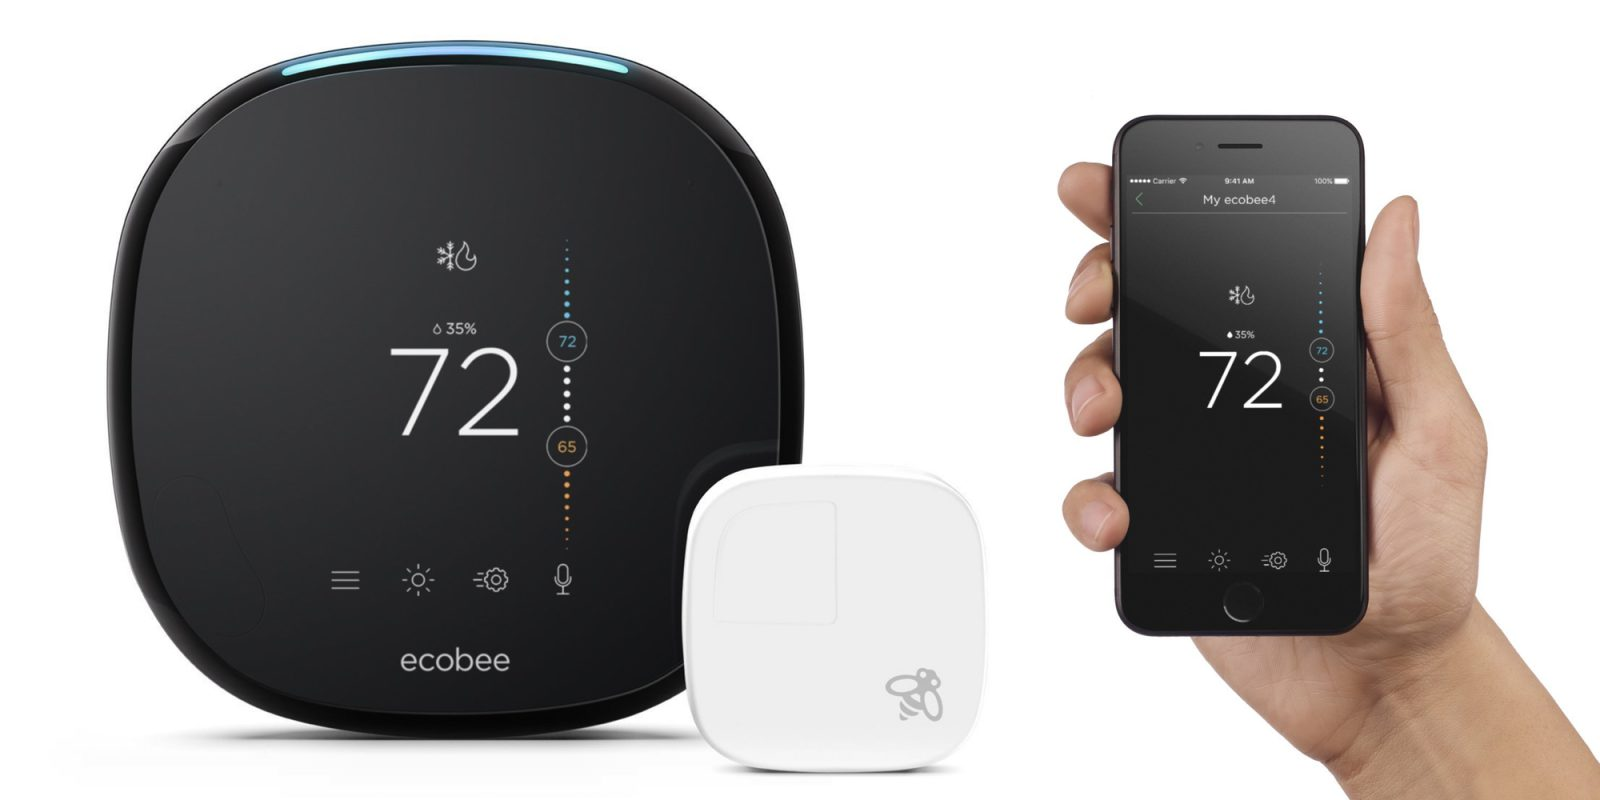 gadgets hogar Automatiza Tu Hogar Con Estos Gadgets Que Podrs Controlar